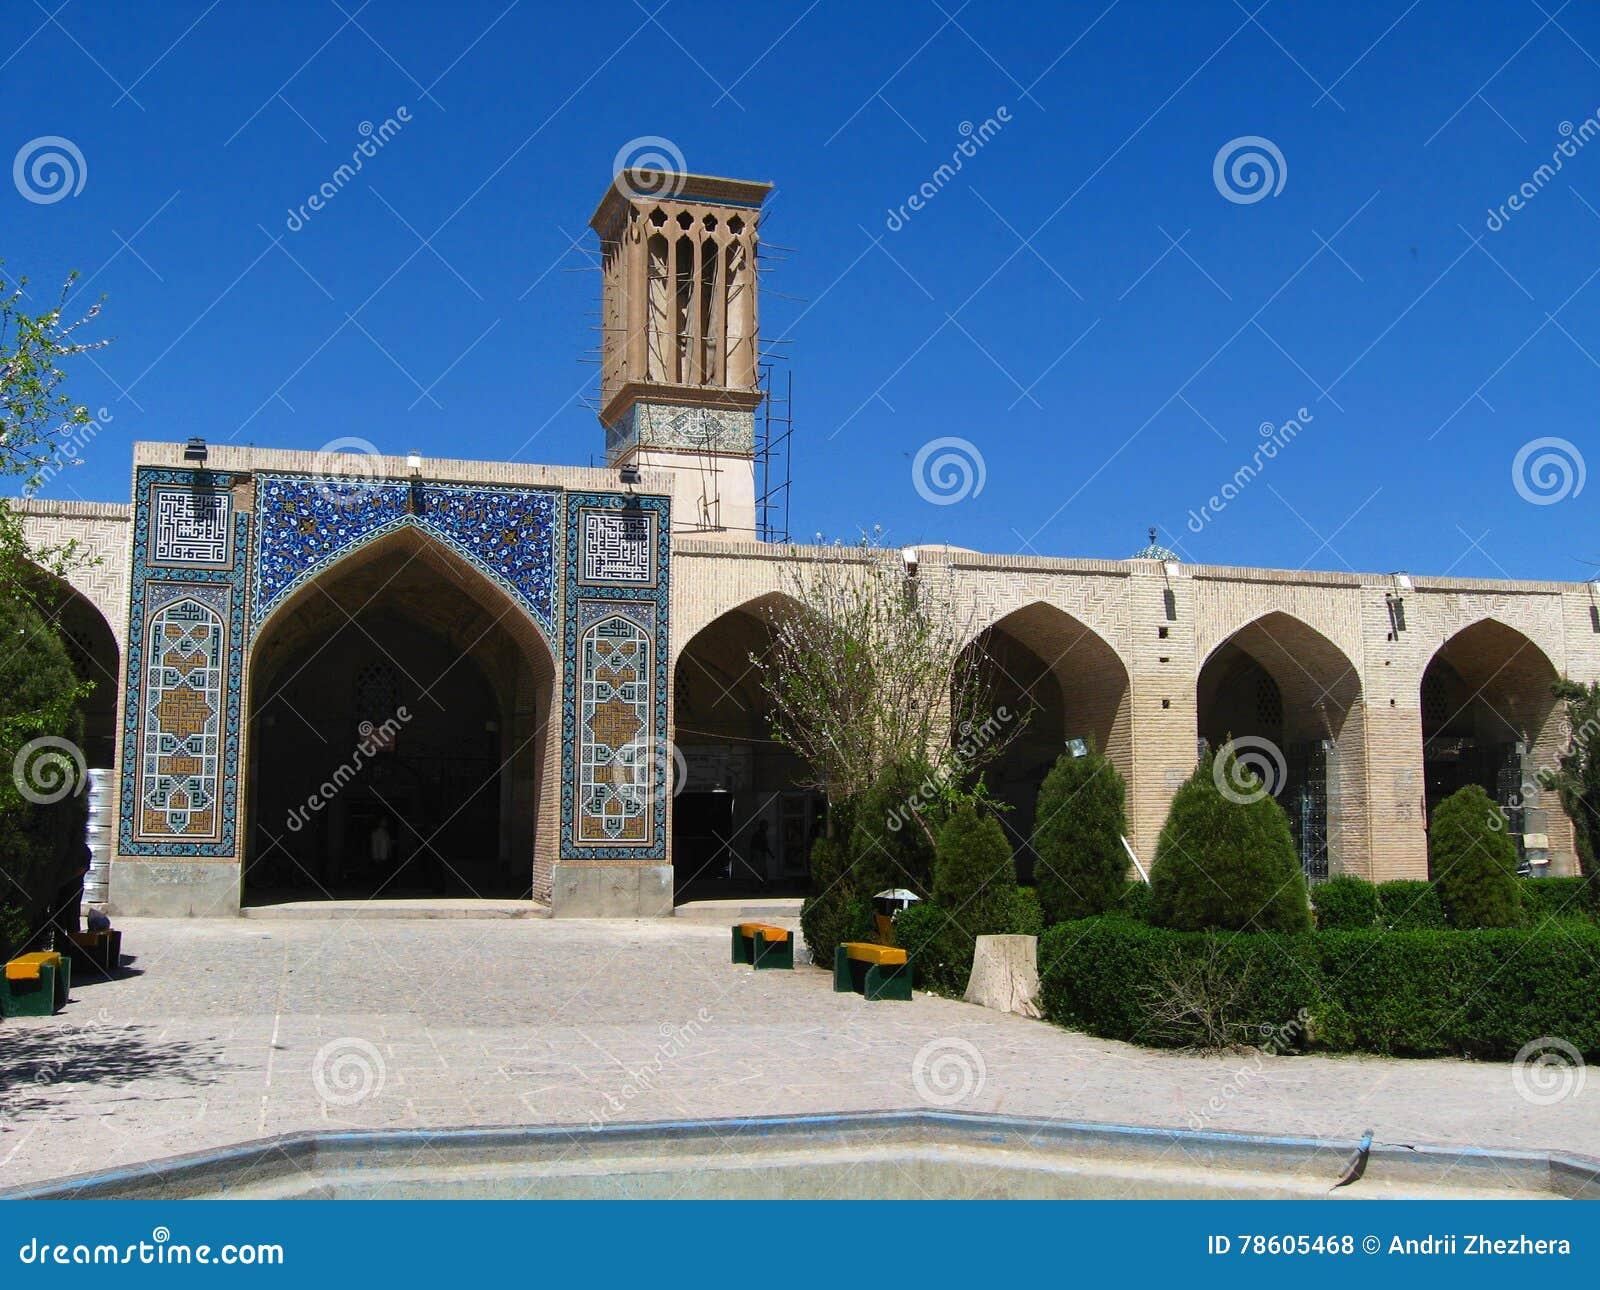 Ganj Ali Khan hammam (bath house) in Kerman, Iran